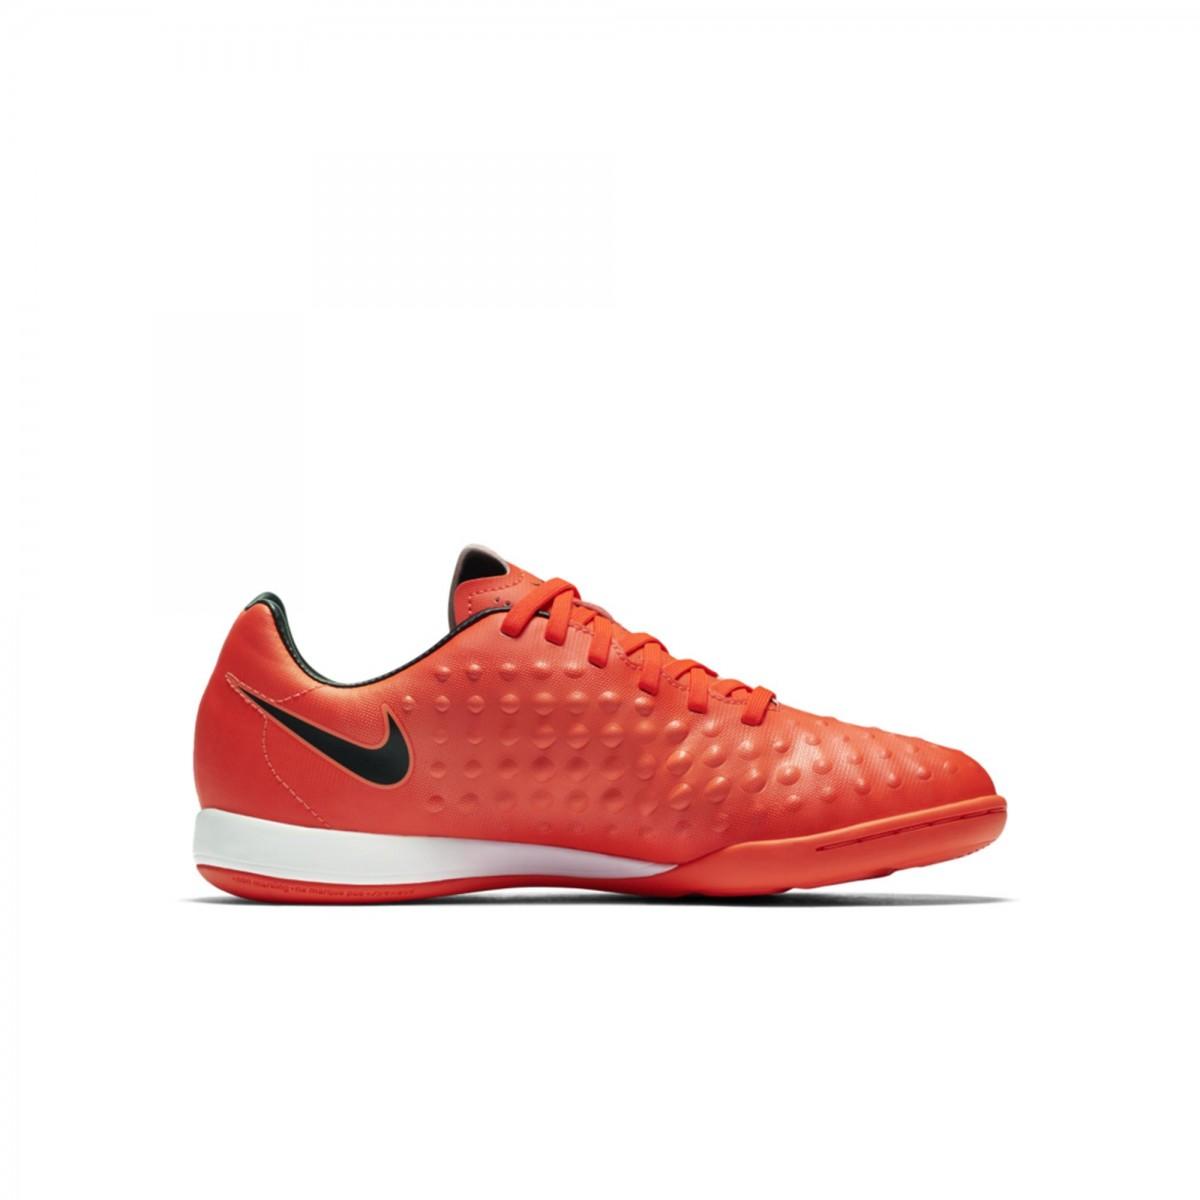 5de5a06b3574b Bizz Store - Chuteira Futsal Infantil Nike MagistaX Opus II JR